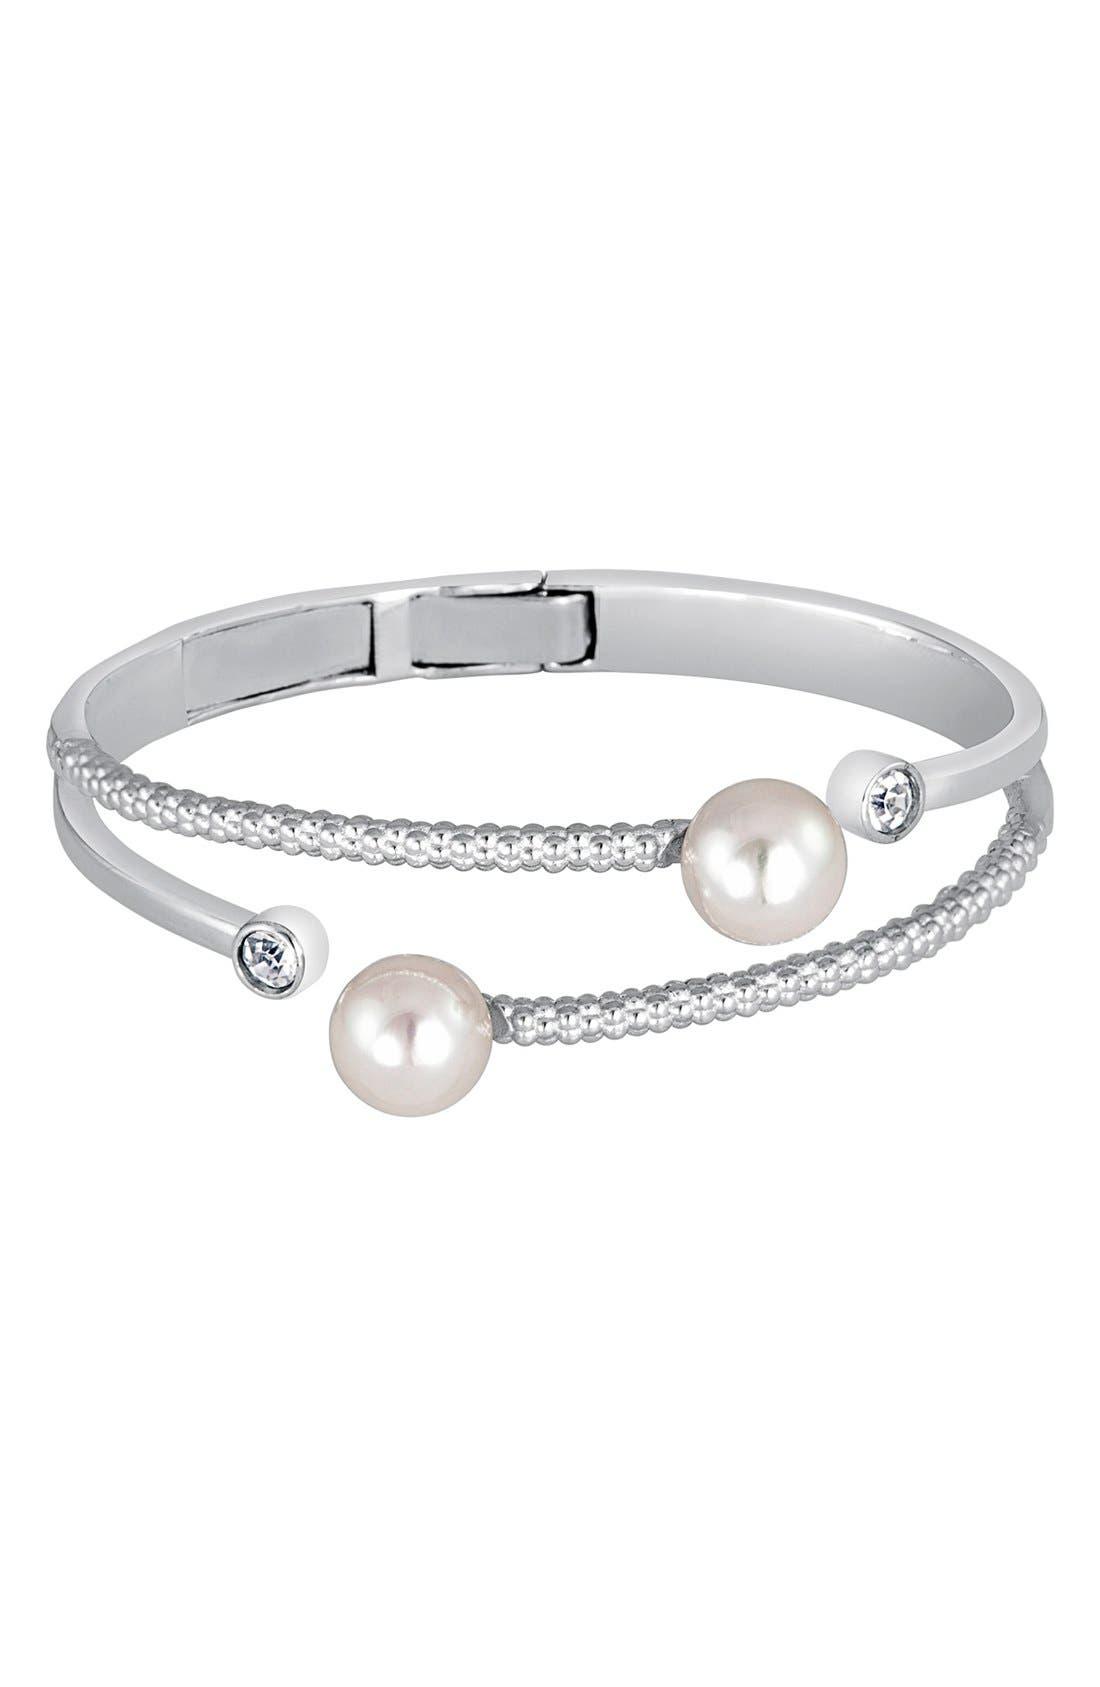 10mm Simulated Round Pearl Cuff,                         Main,                         color, White